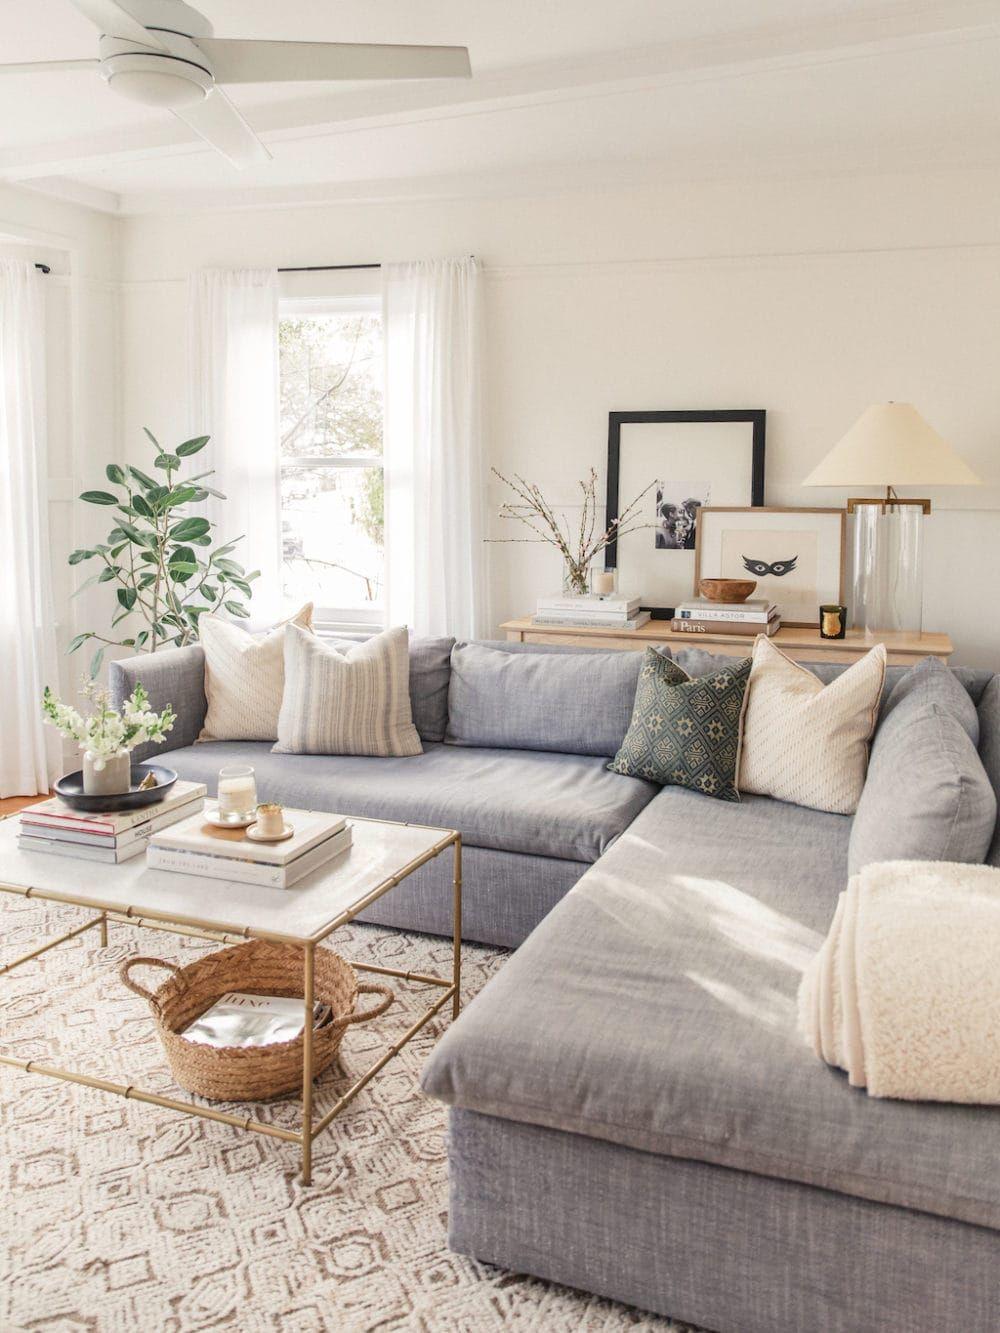 Home Decorating Trends 2020 24 Popular Interior Decor Ideas In